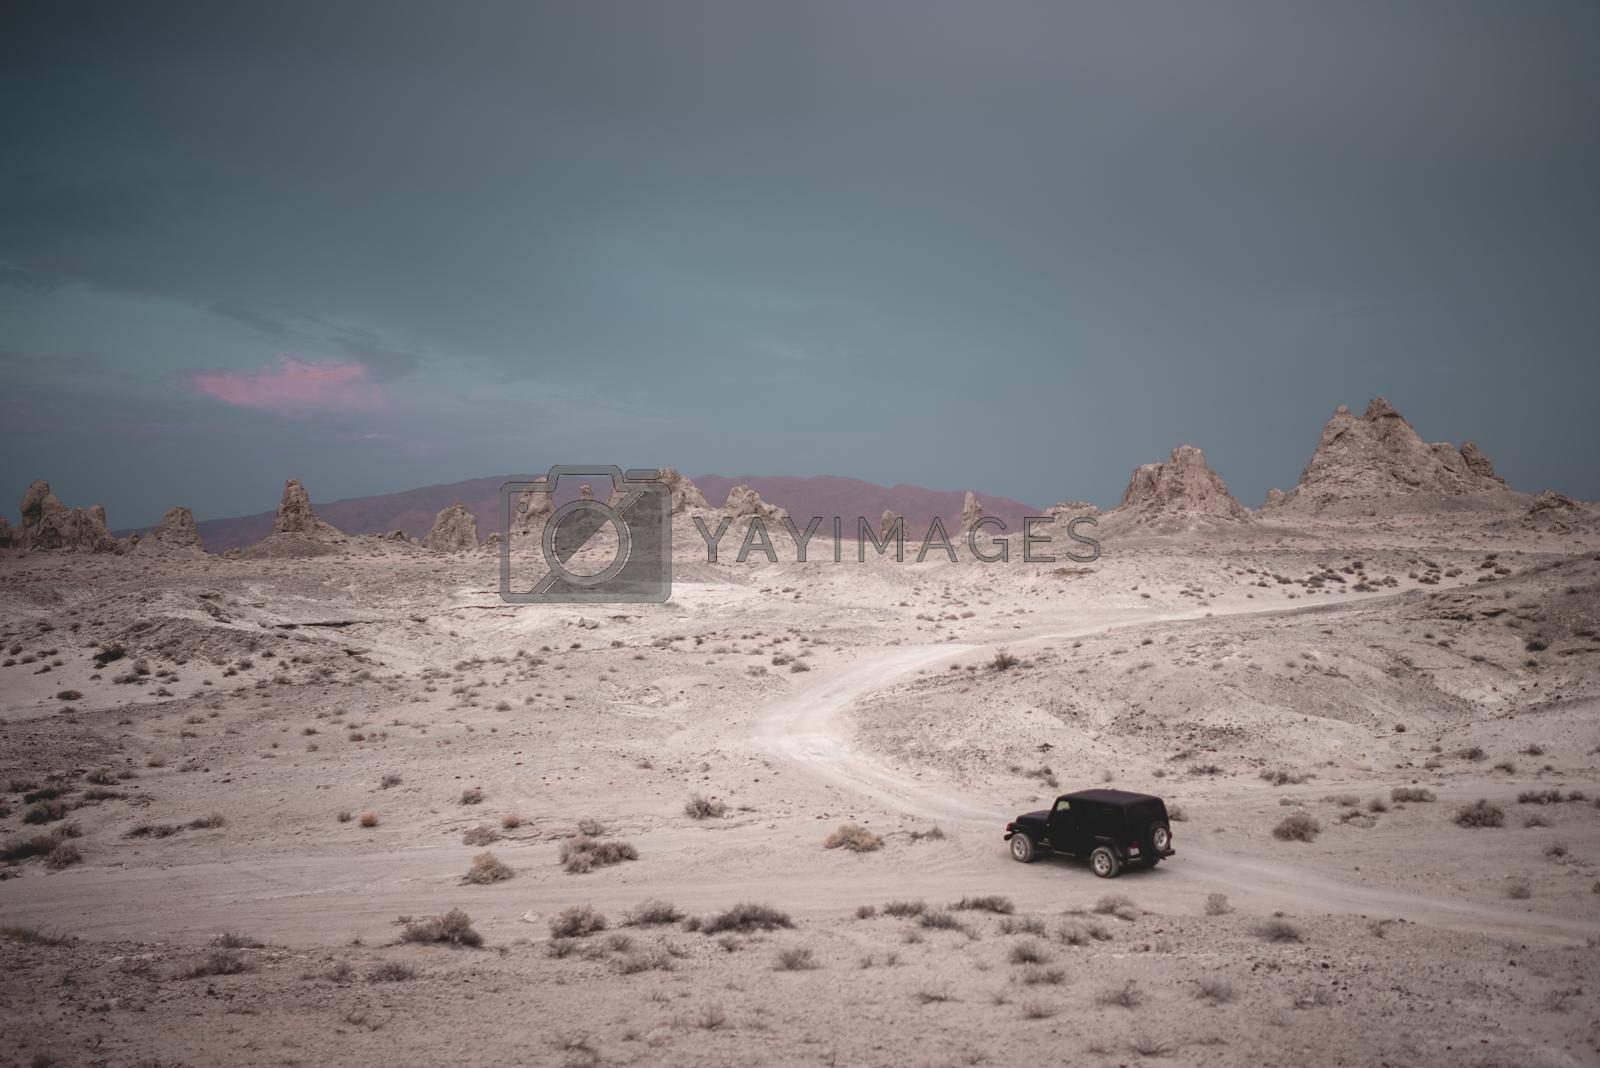 A jeep sits in a desert in California.